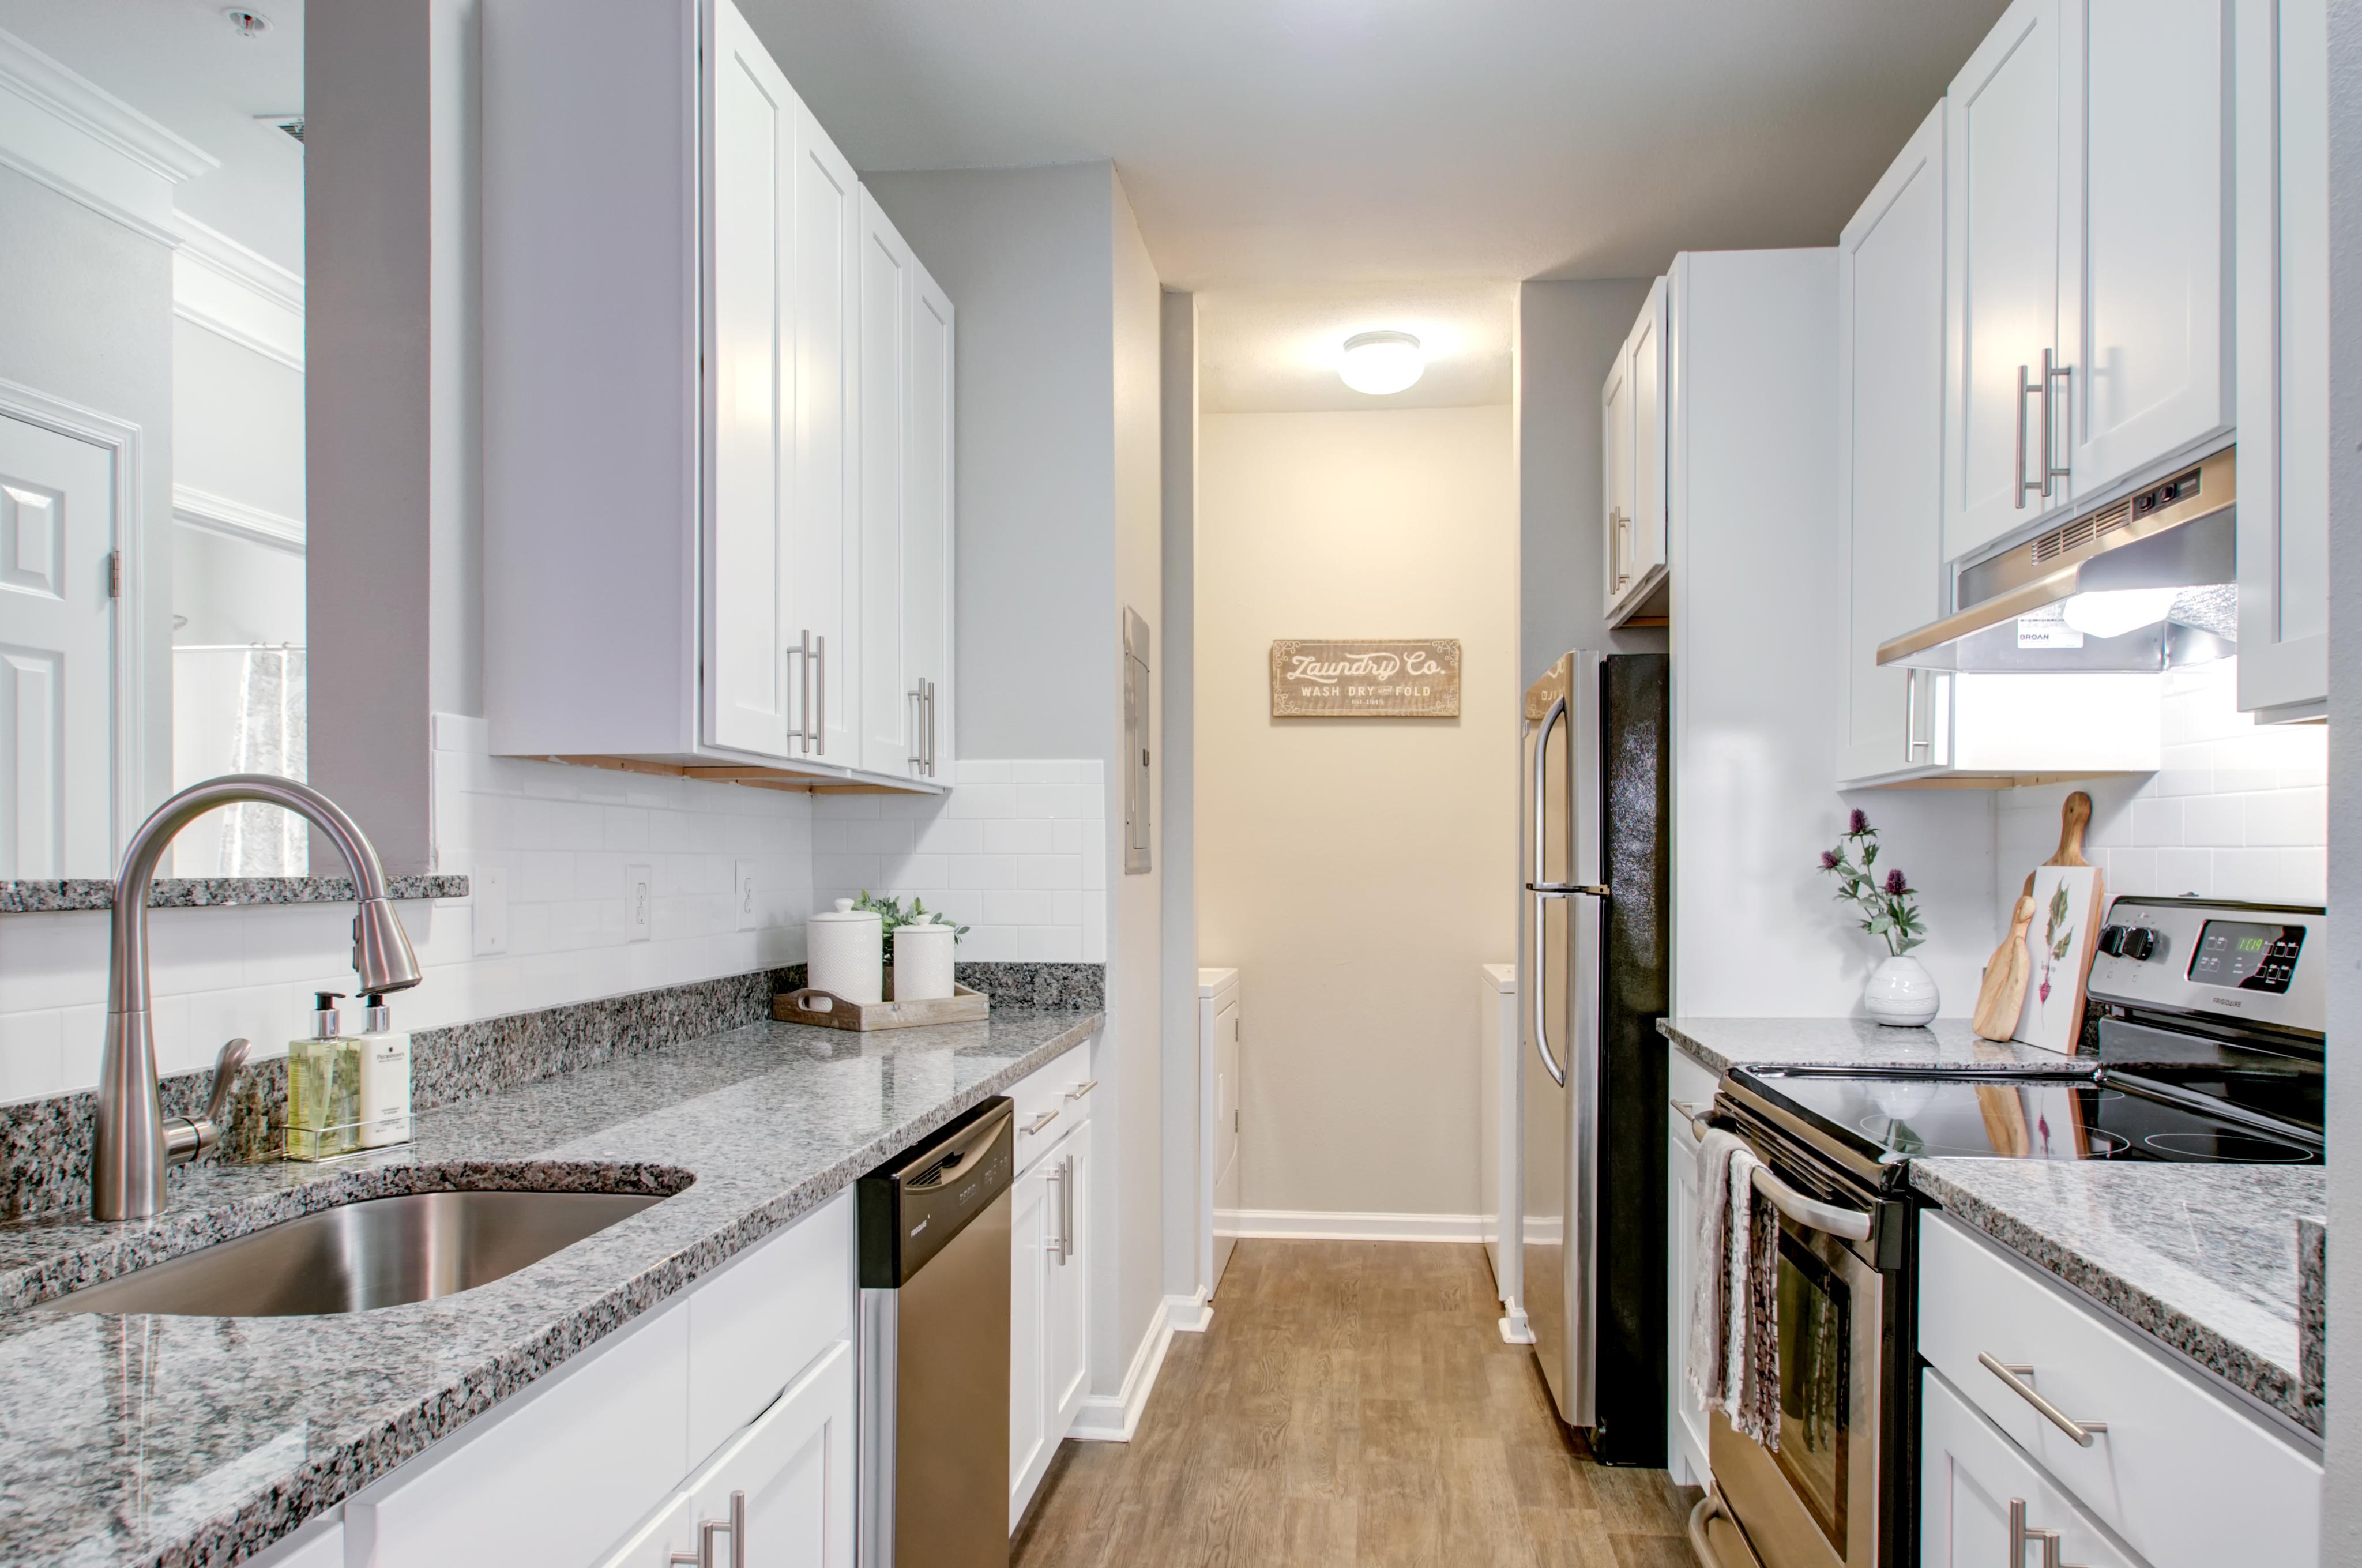 Phenomenal Apartments In Mt Laurel For Rent Mount Laurel Crossing Home Interior And Landscaping Mentranervesignezvosmurscom